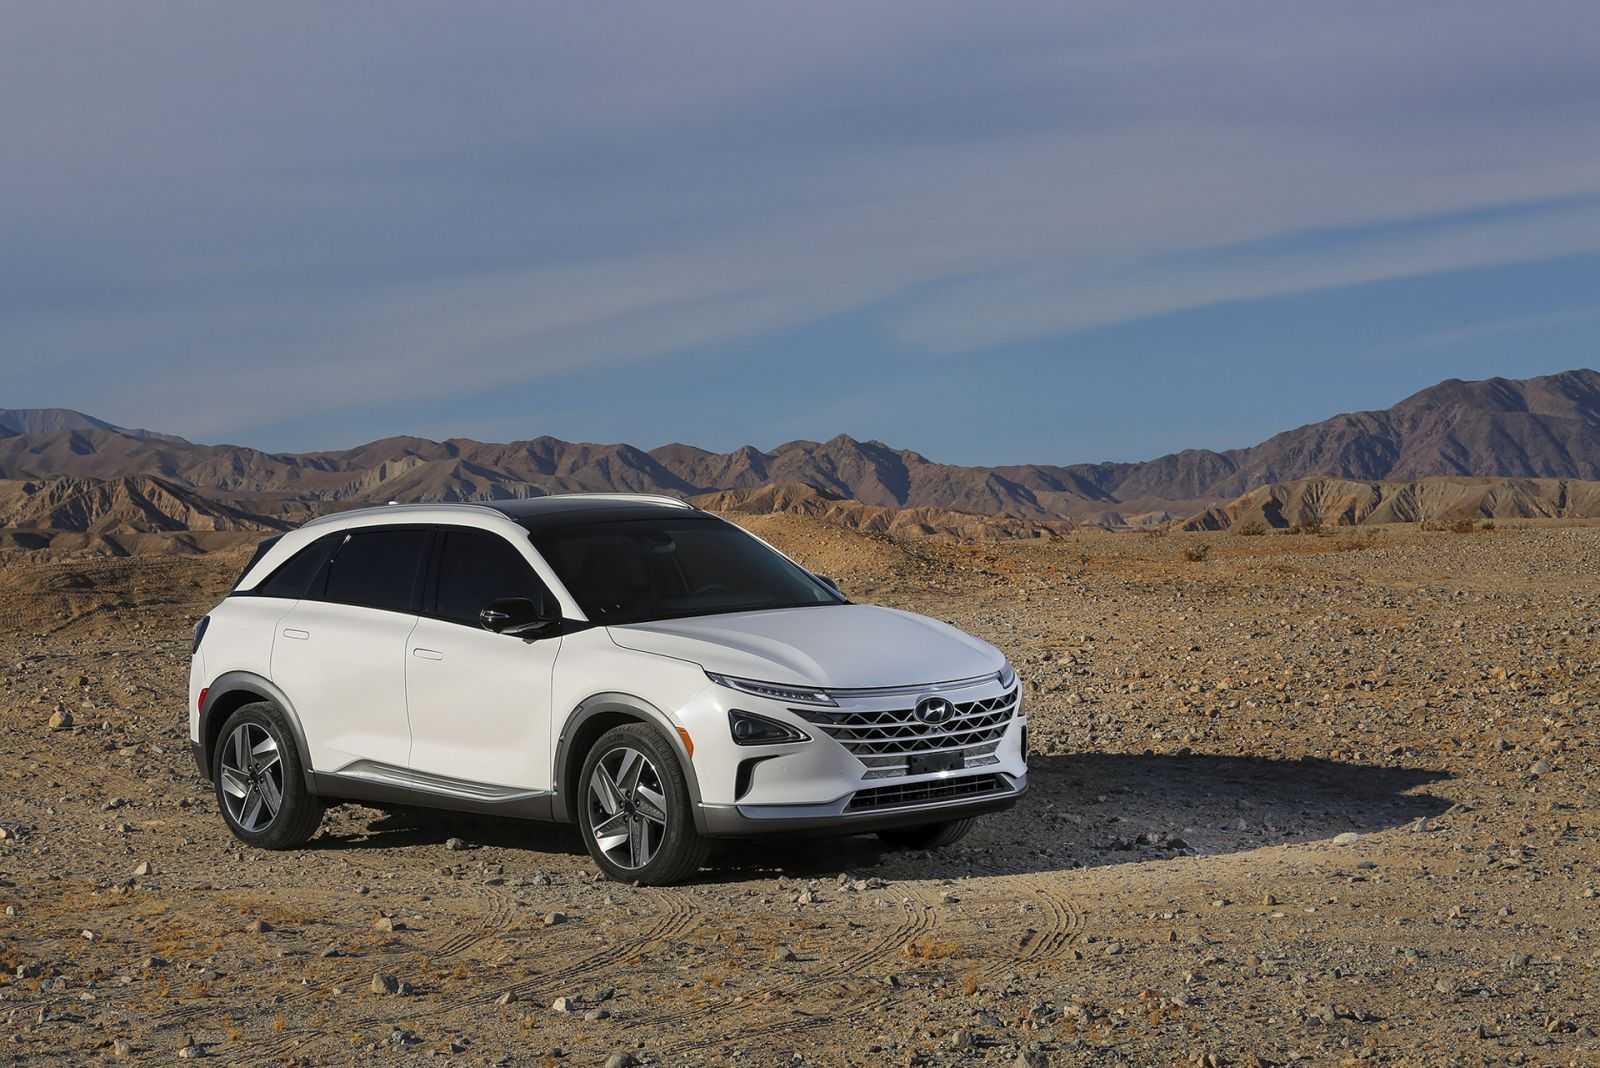 Le Hyundai Nexo